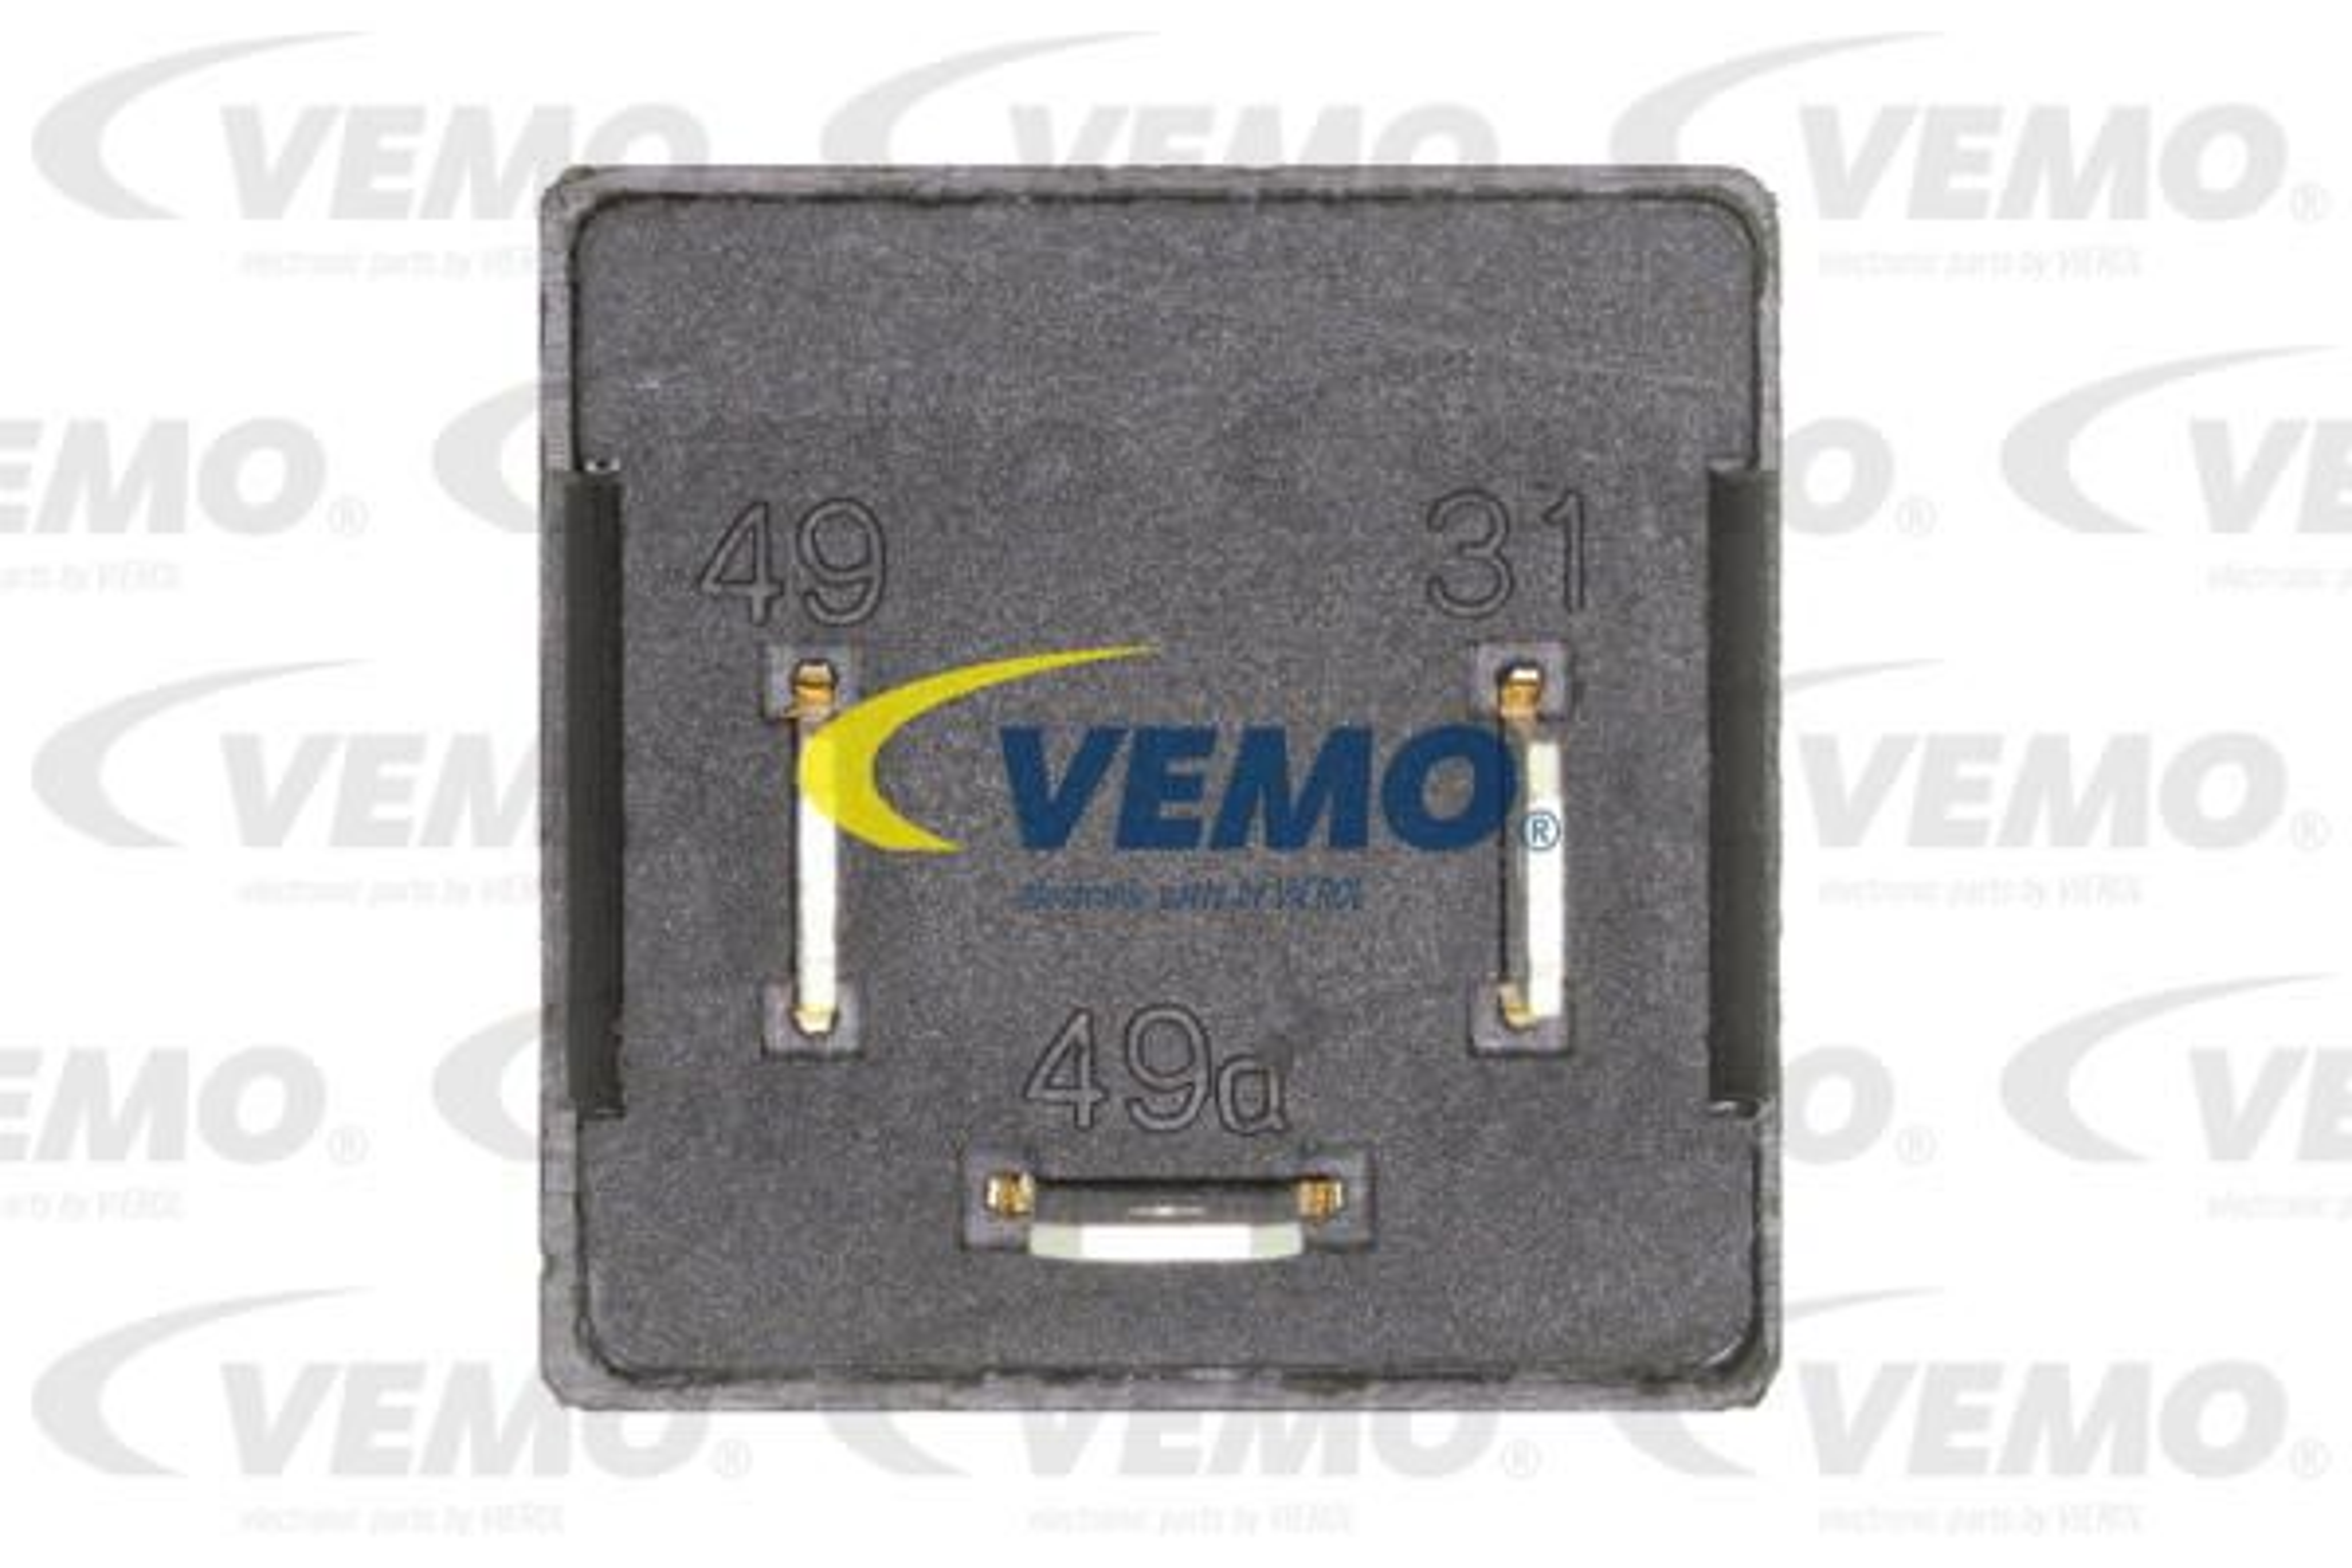 Warnblinkrelais VEMO V15-71-0011 Bewertung